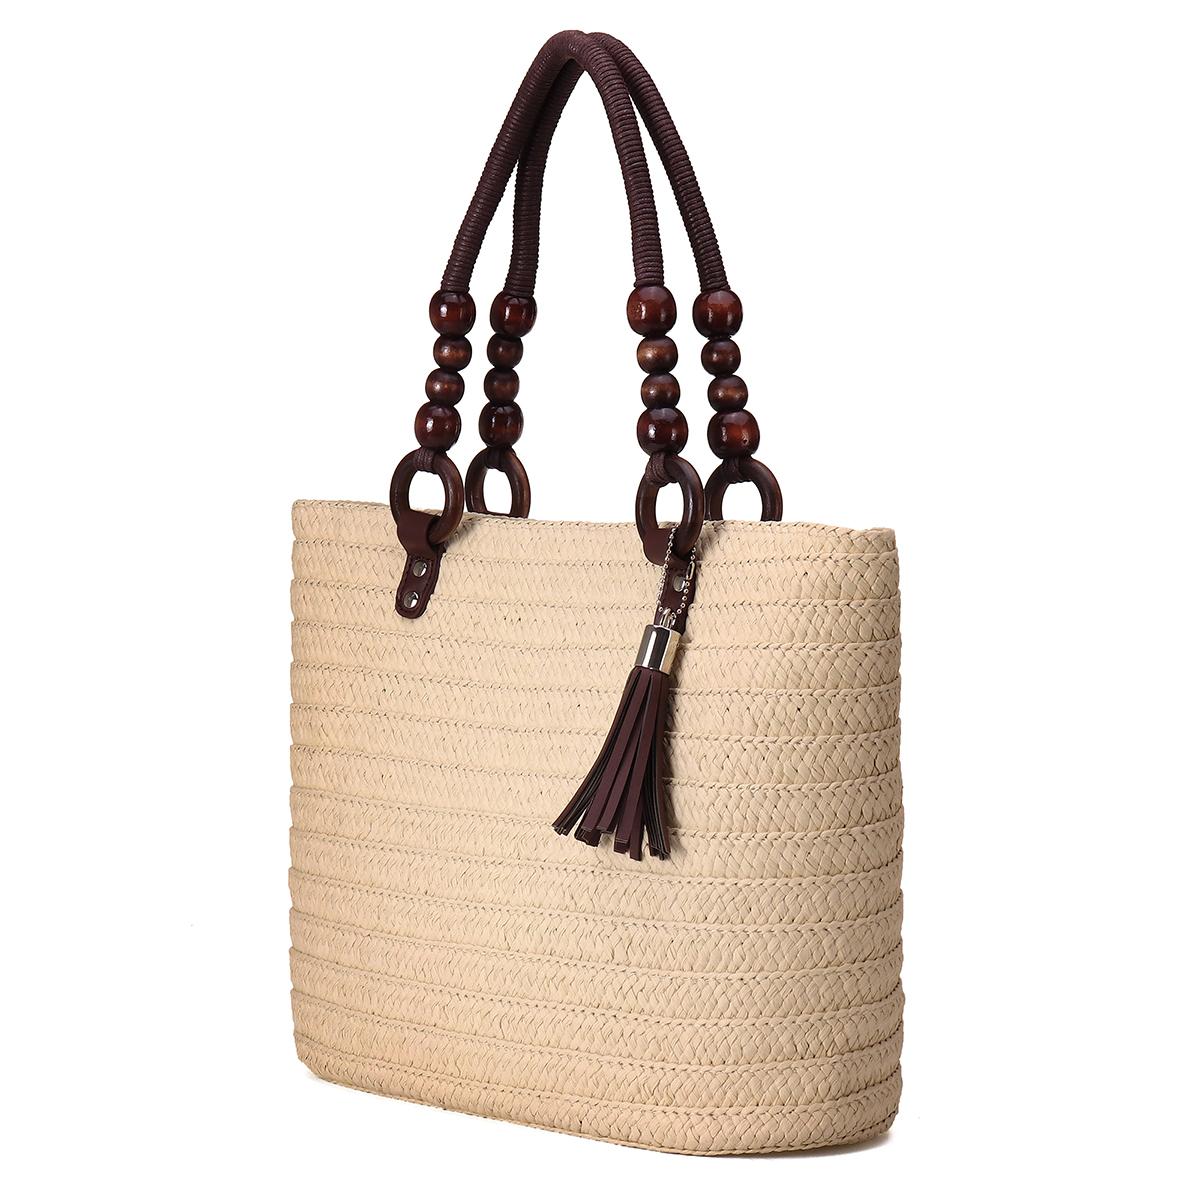 Women Summer Tassel Straw Shoulder Bag Top Handle Satchel Handbag